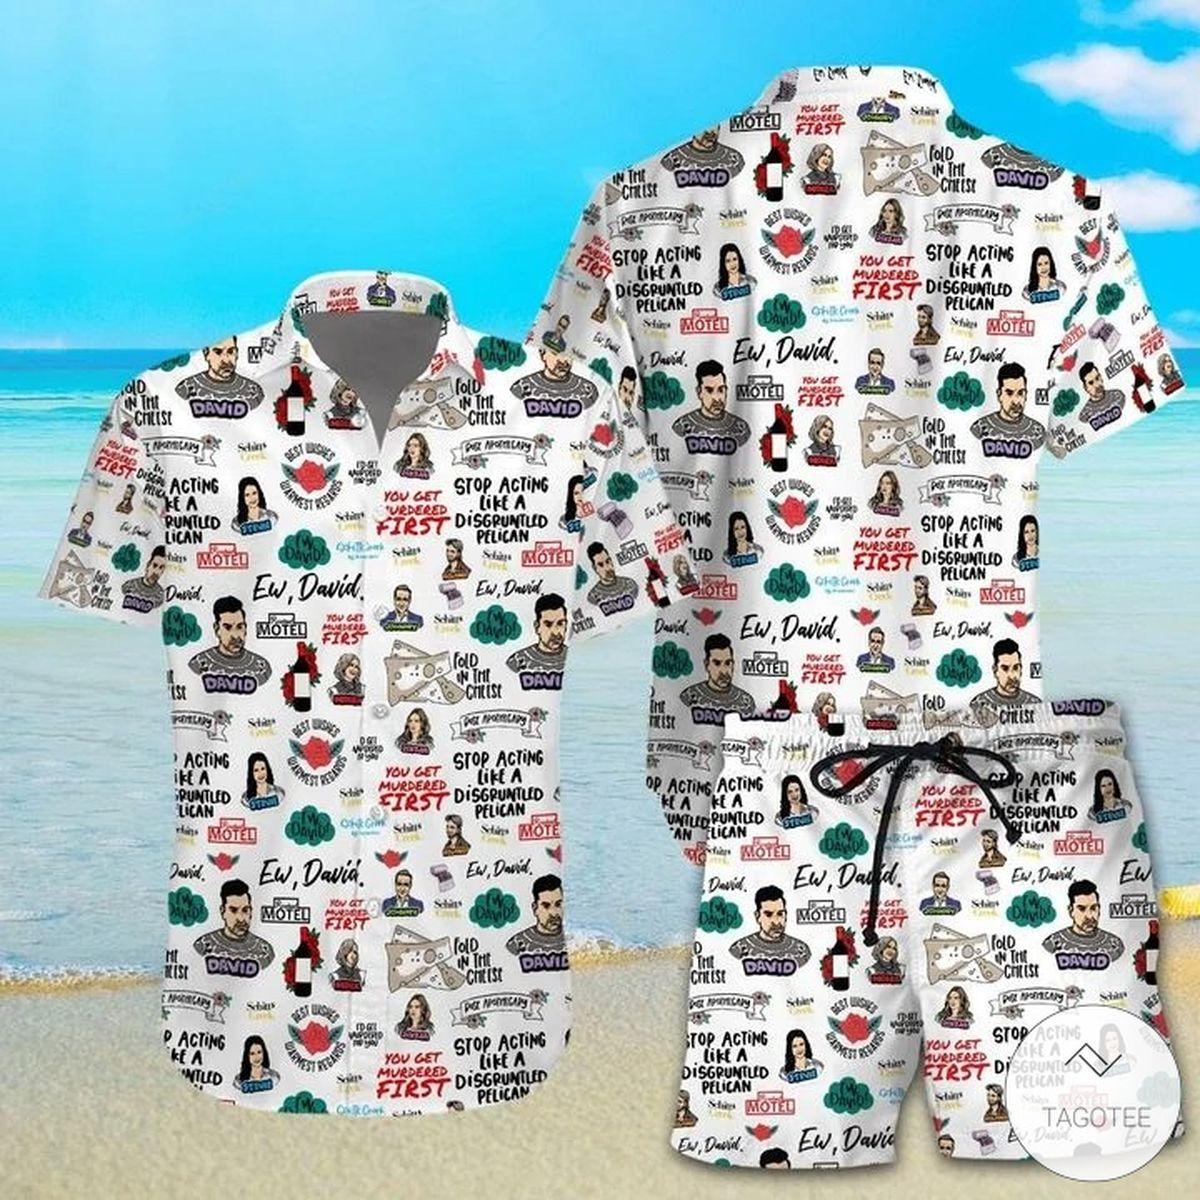 Schitt's Creek Ew David Hawaiian Shirt, Beach Shortsz